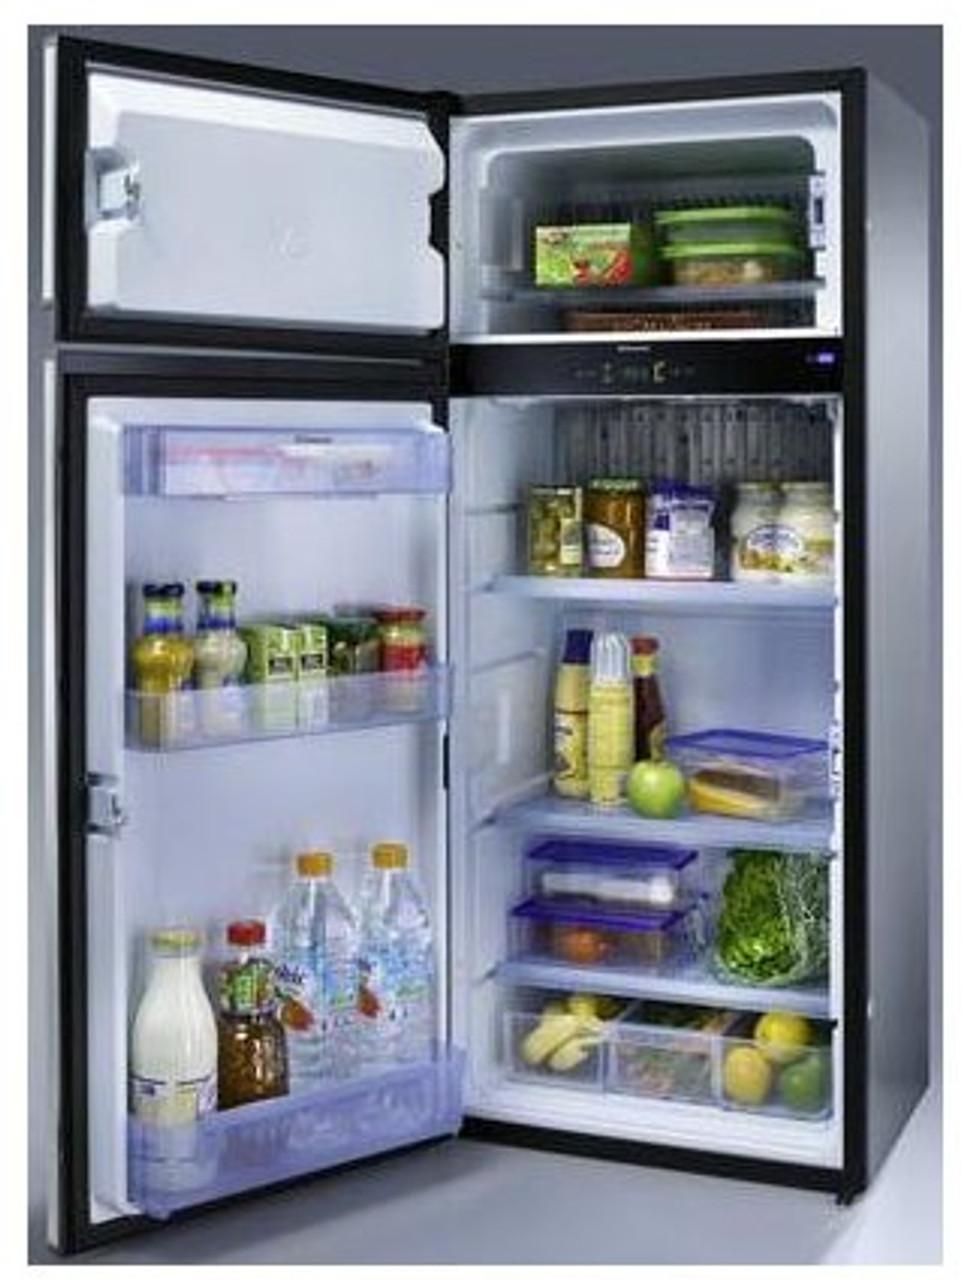 Dometic RMD 8551 Caravan Motorhome Fridge Refrigerator